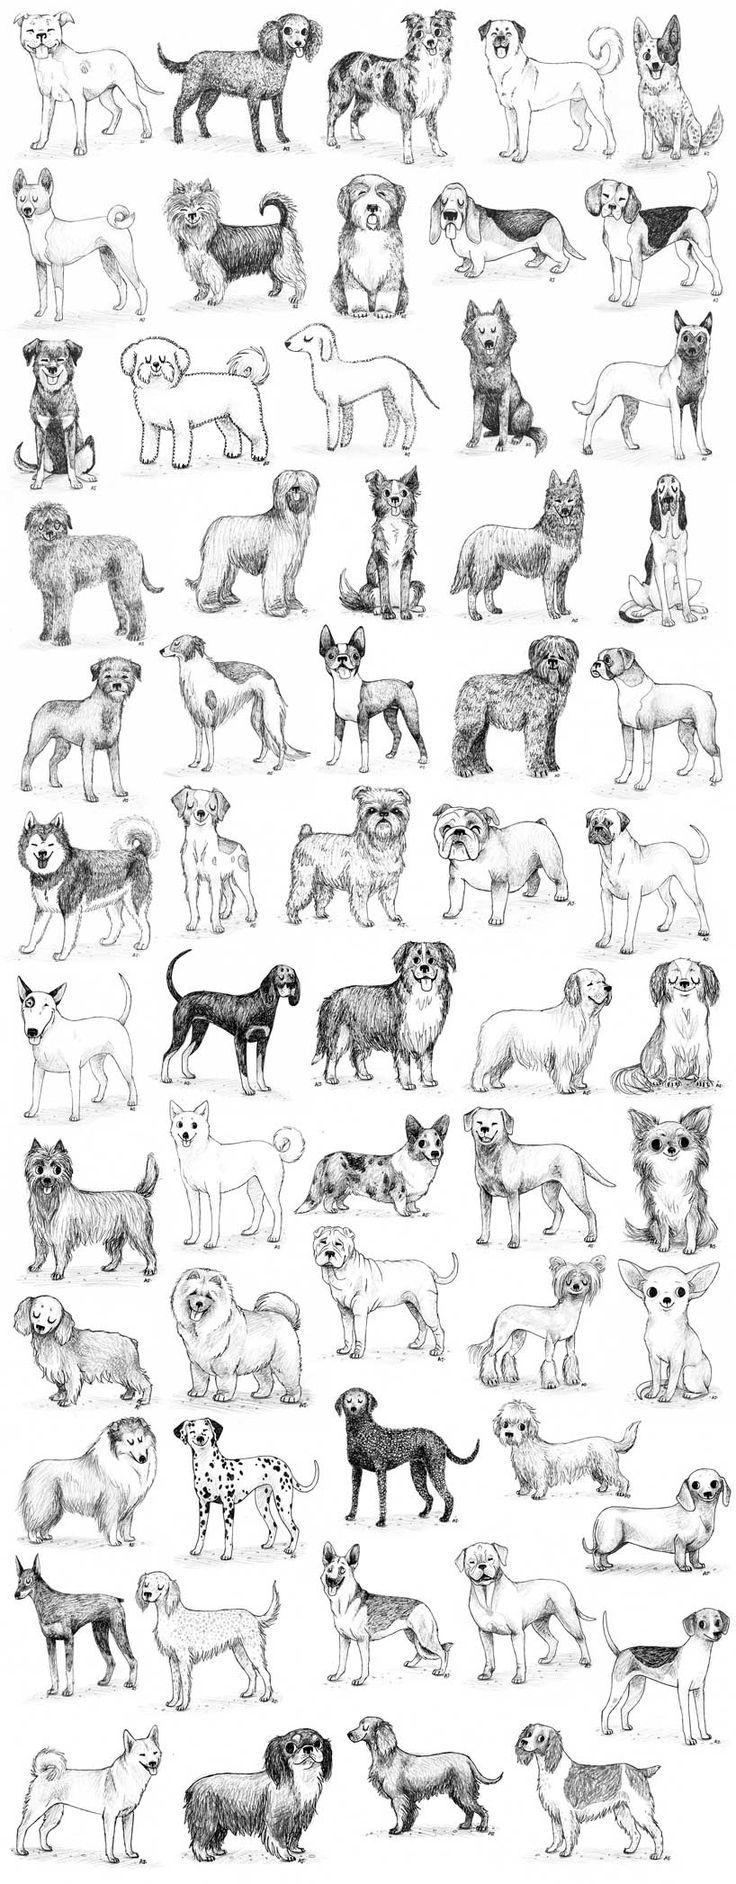 Hunde #Hunde #Hunde #von # ~ aj00 #auf #deviantART